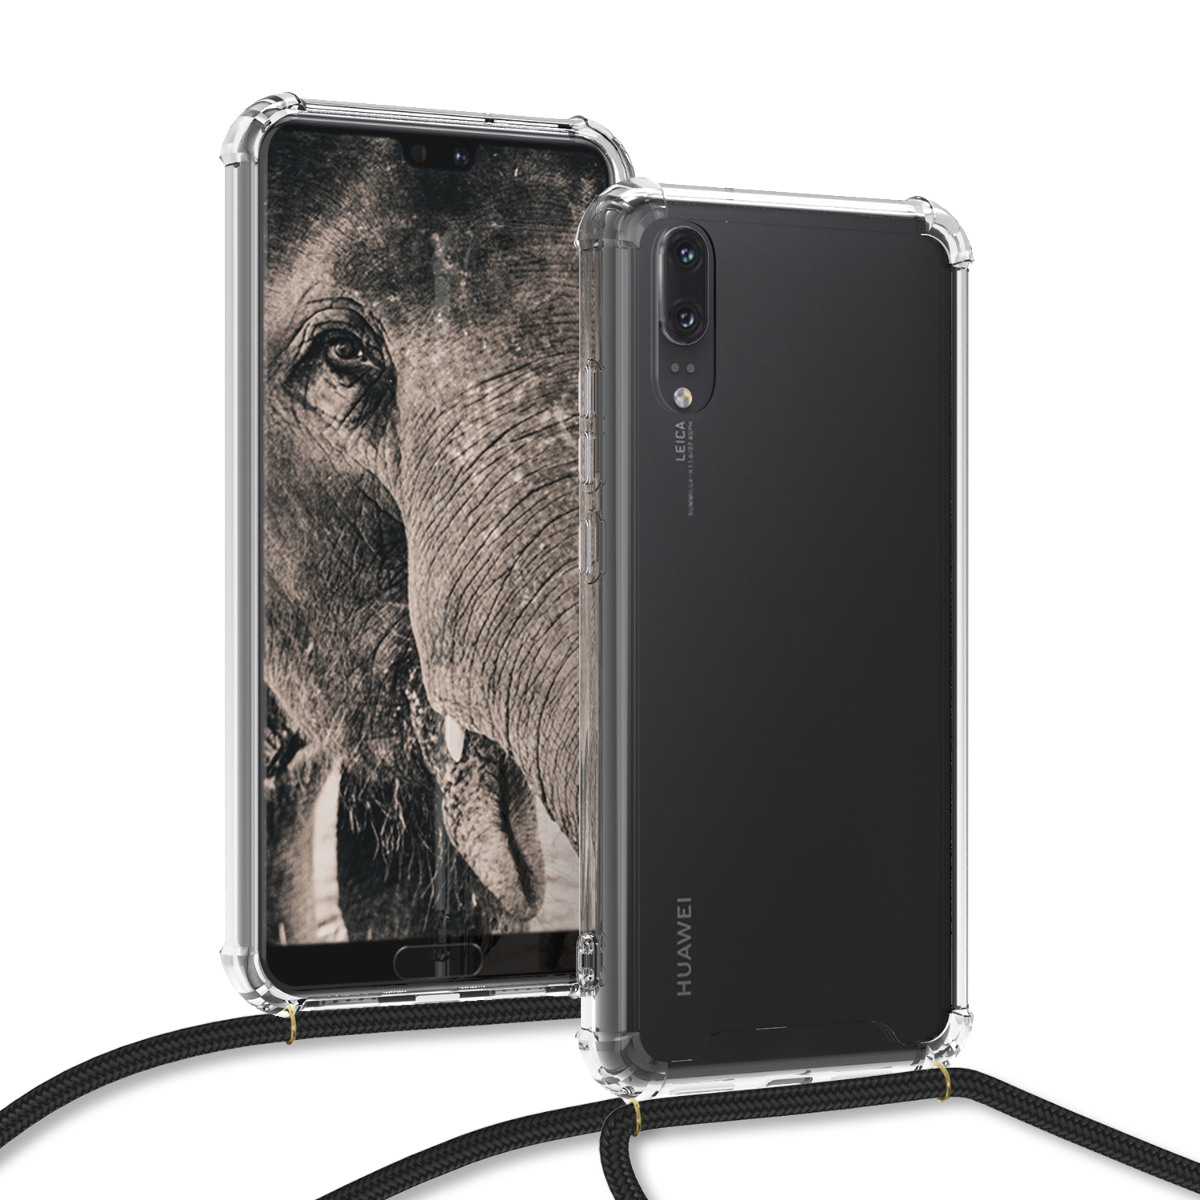 KW Θήκη Σιλικόνης με Λουράκι Λαιμού Huawei P20 - Transparent (48424.03)